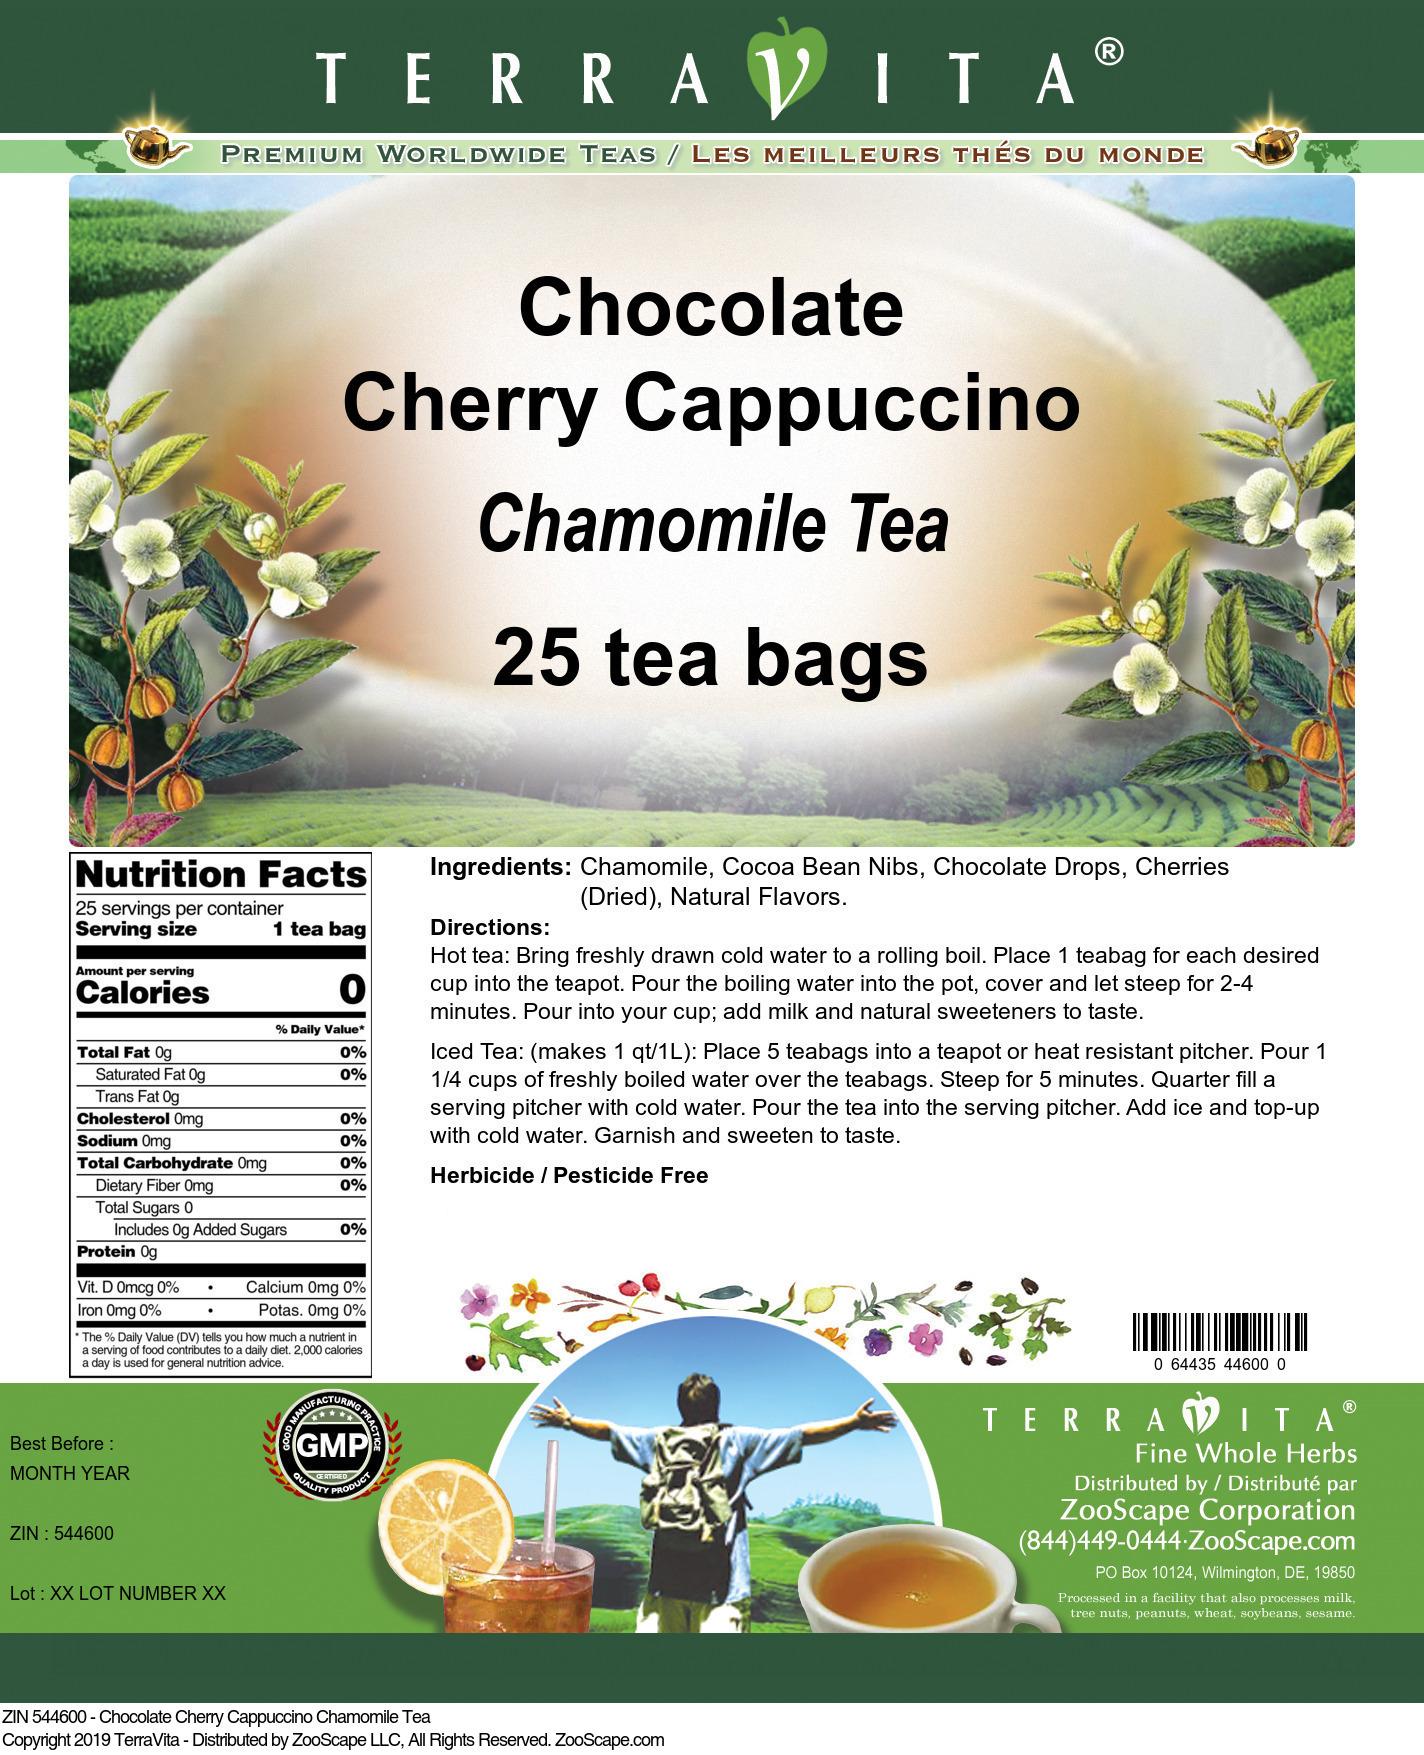 Chocolate Cherry Cappuccino Chamomile Tea